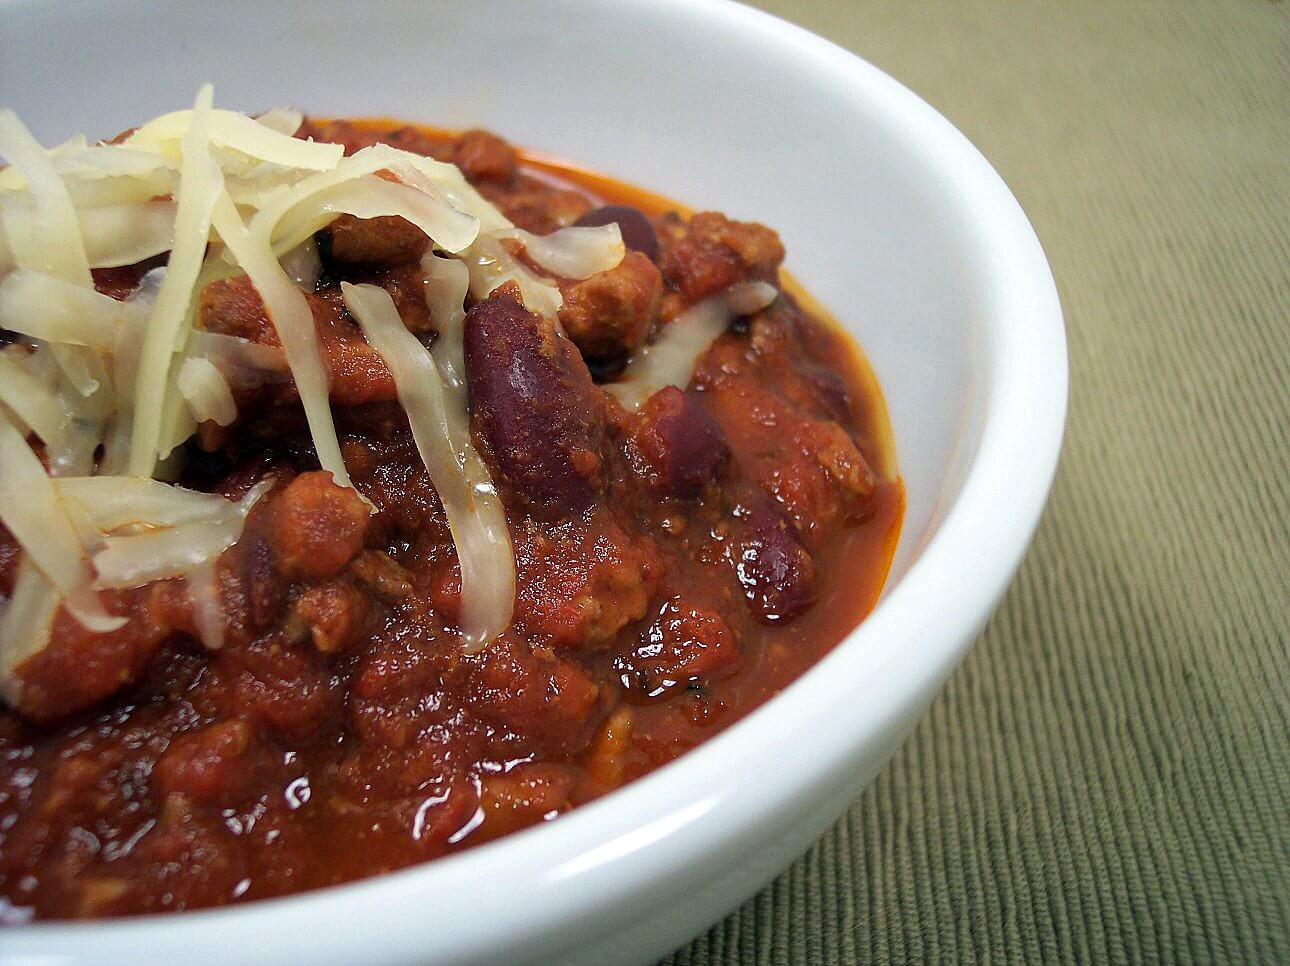 Chilis tailgate dish